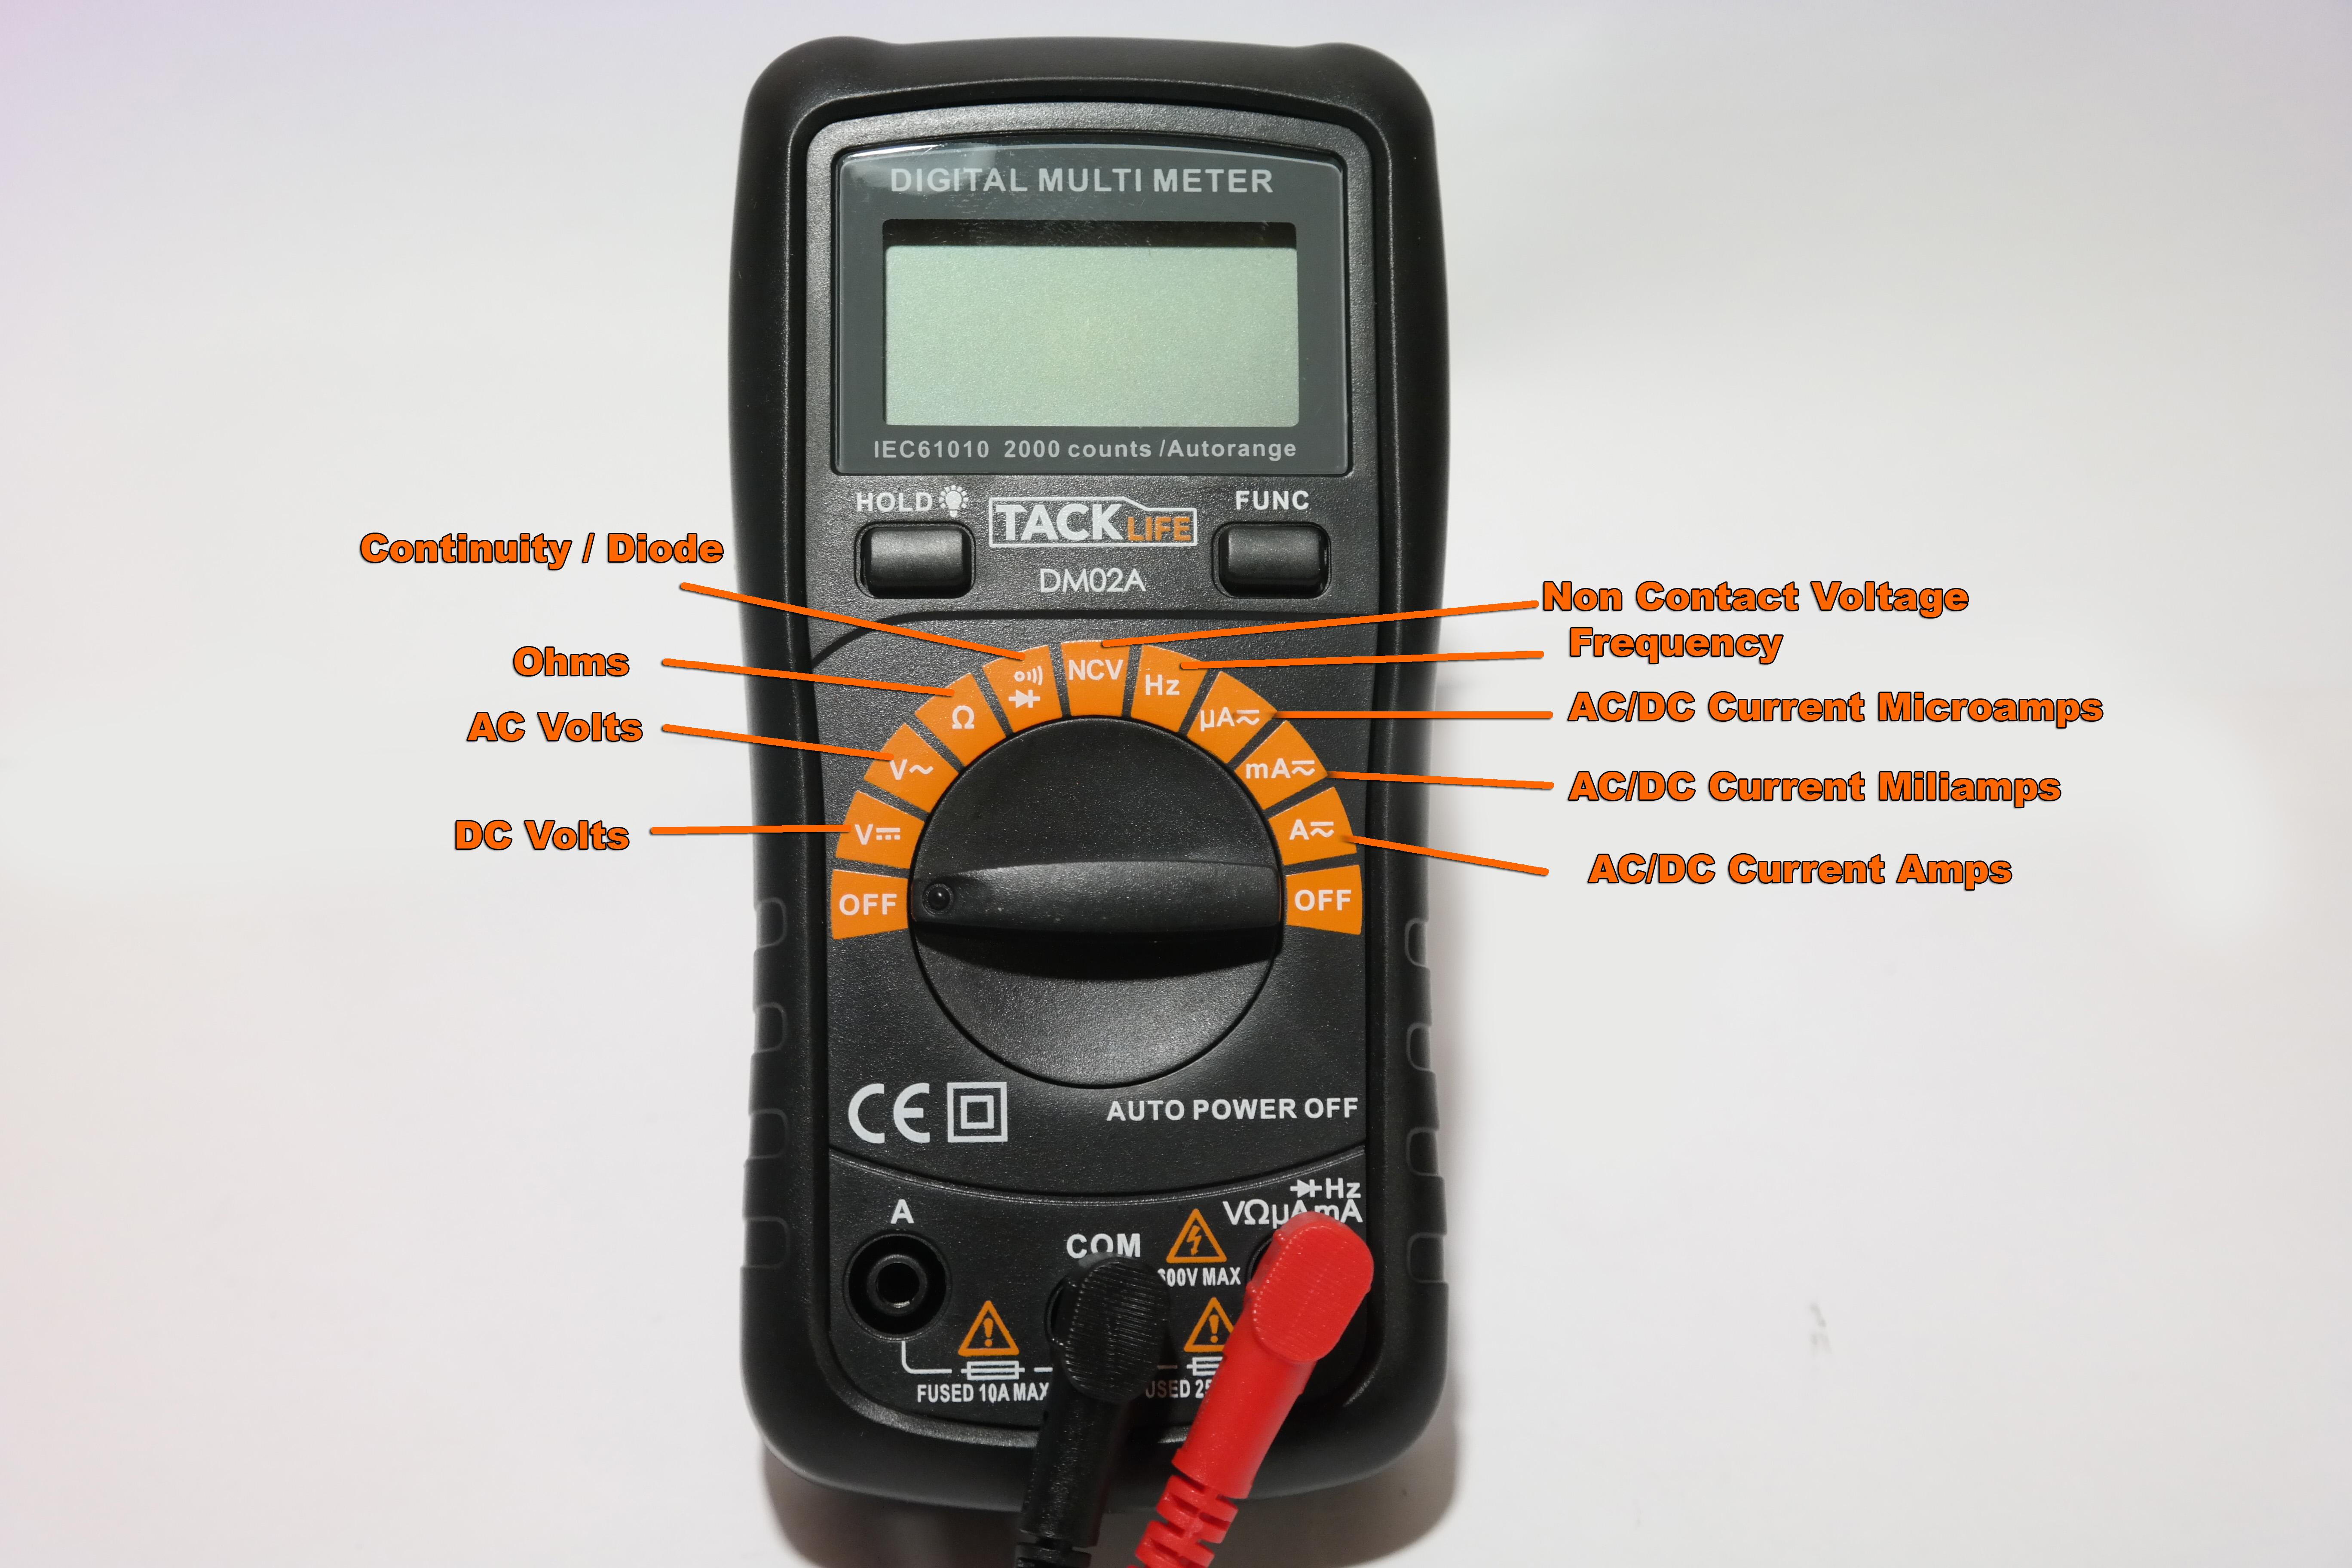 Engine Science The Digital Multi Meter Isavetractors Kohler K341 Voltage Regulator Wiring Diagram Symbols On